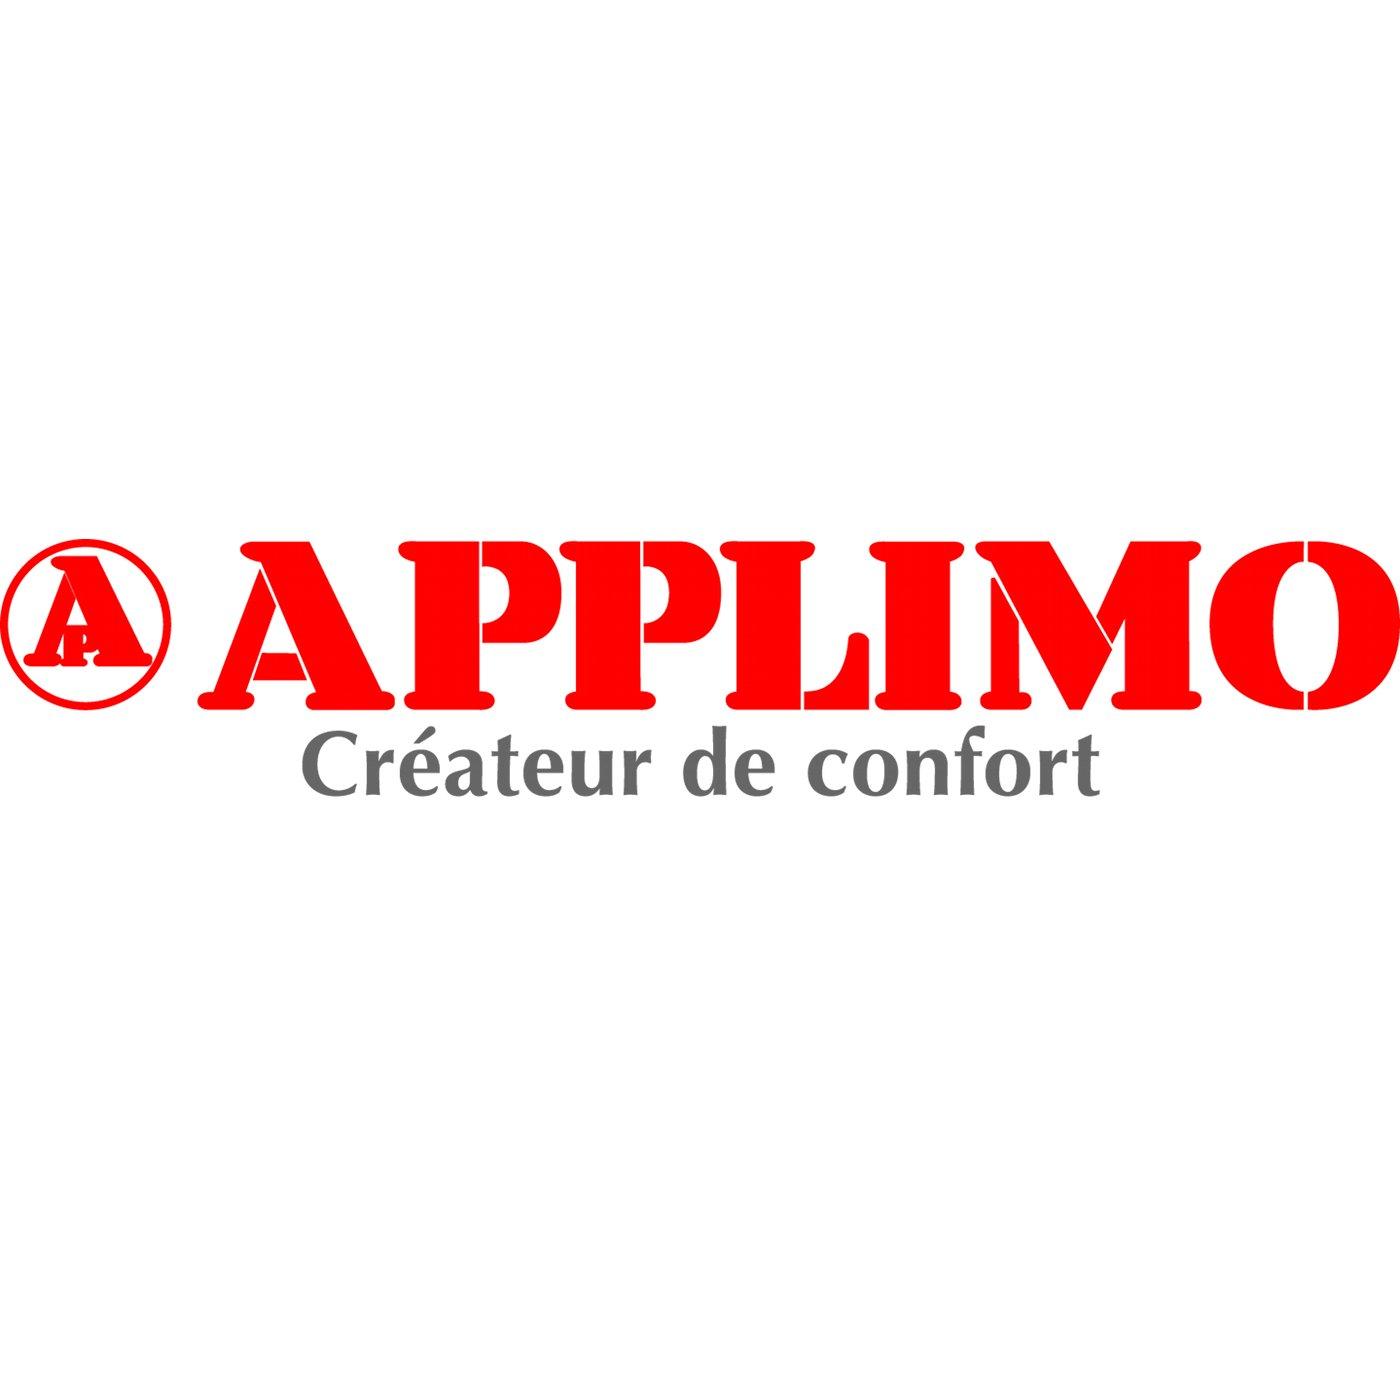 Chauffage APPLIMO